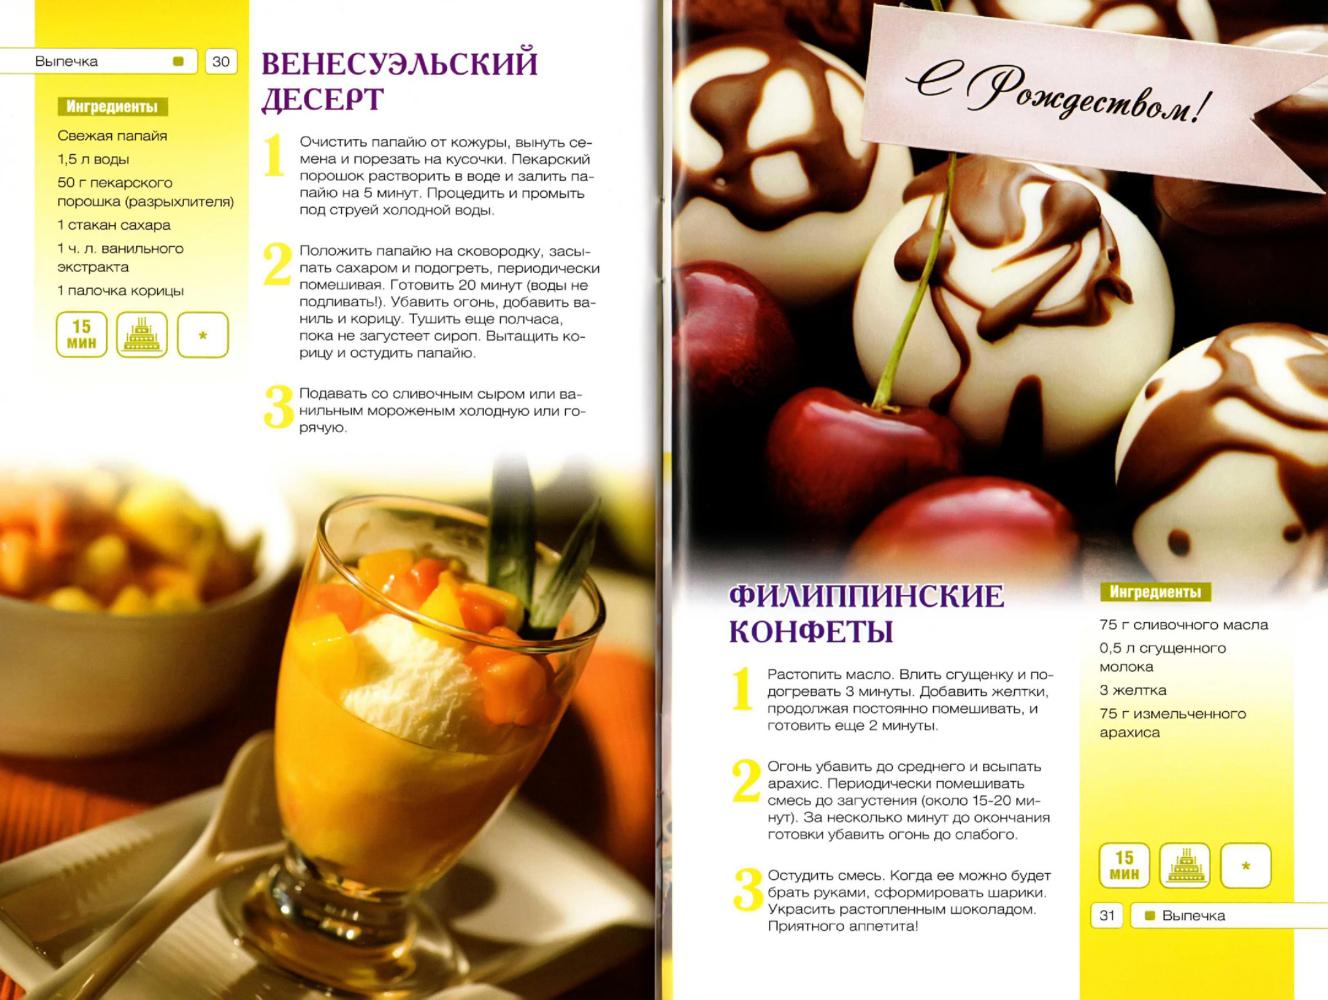 http://i2.imageban.ru/out/2013/12/20/d089e4a9afe581276f3f75f92e6ce859.jpg